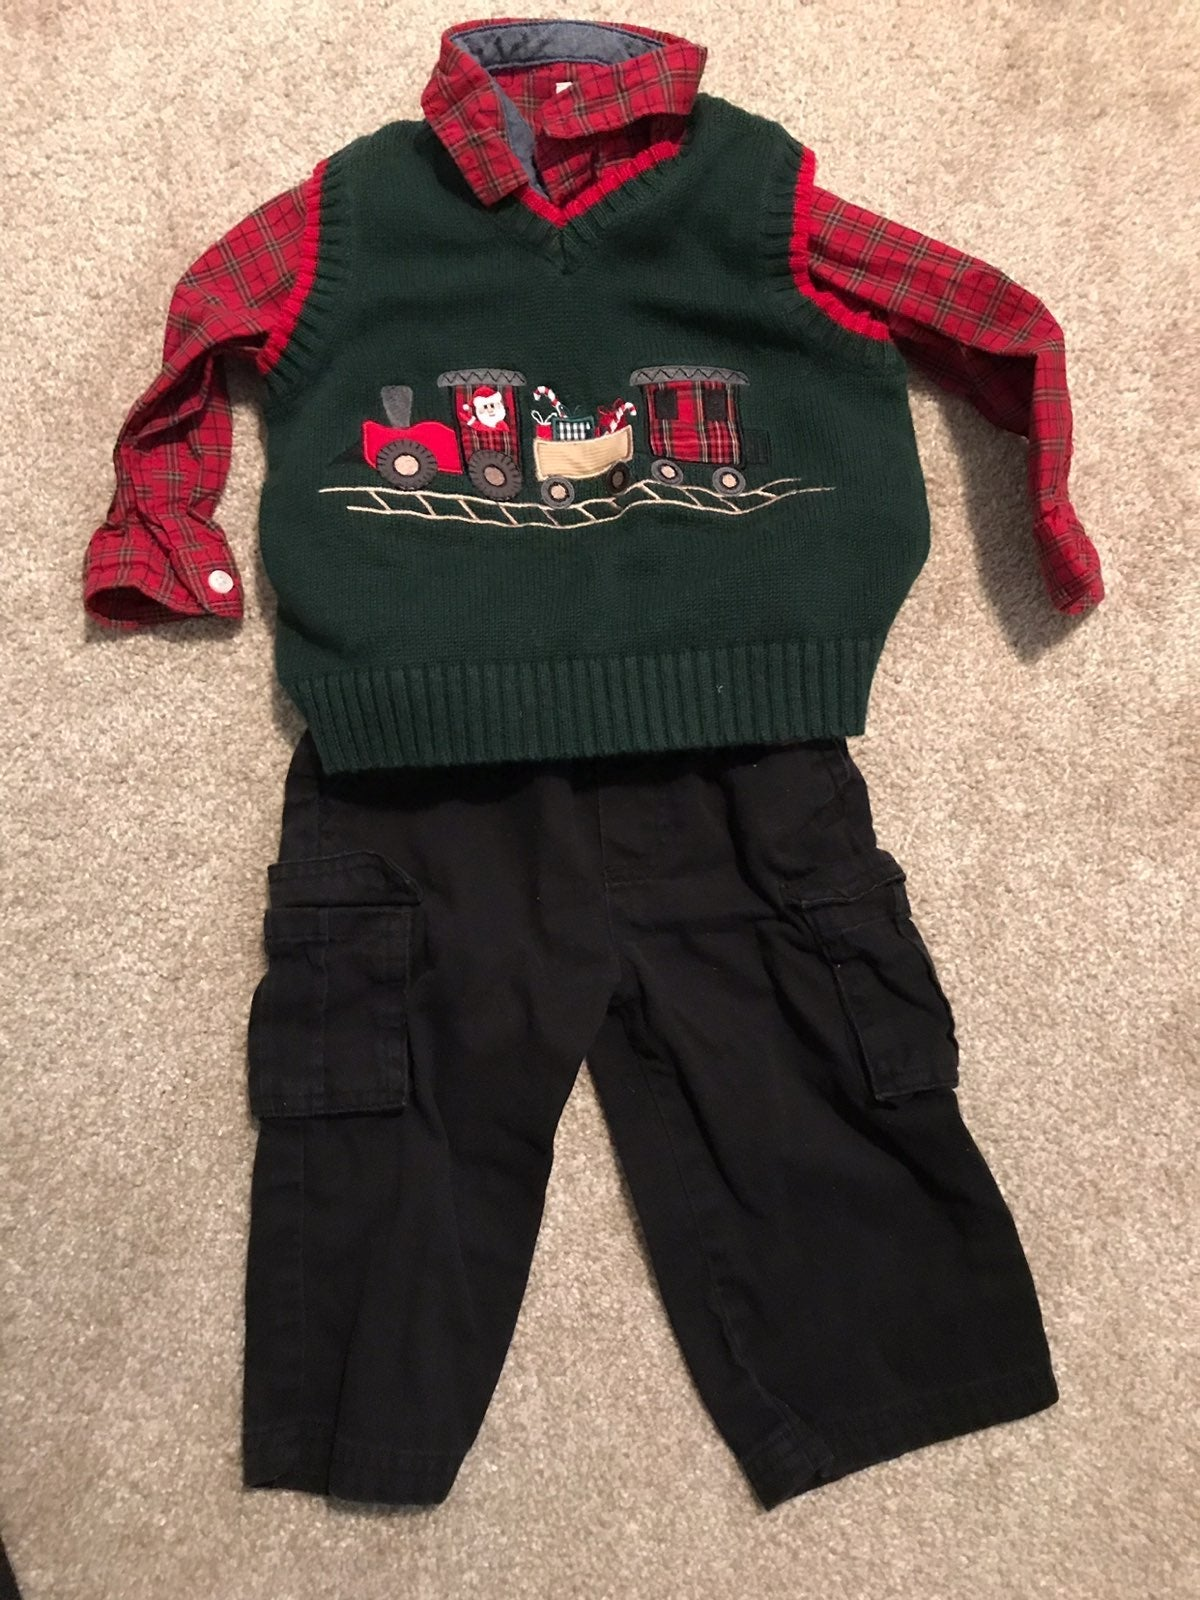 Toddler boy christmas